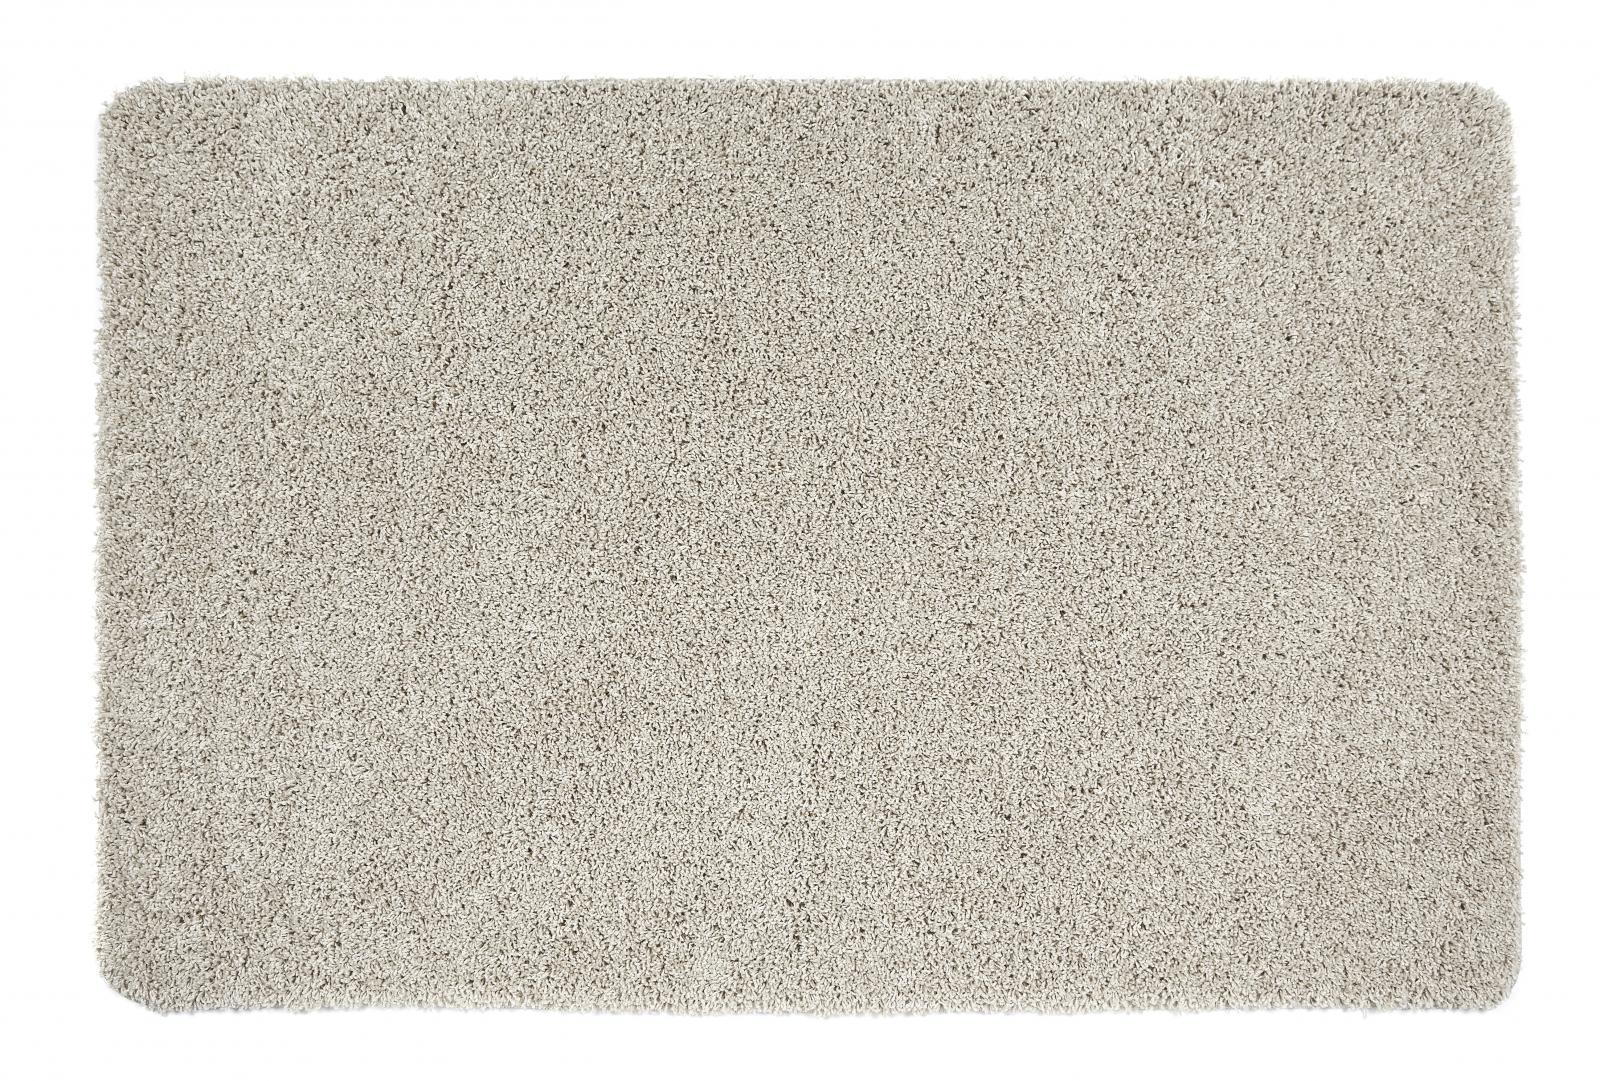 Pavillion Grey Mat – Now Only £20.00